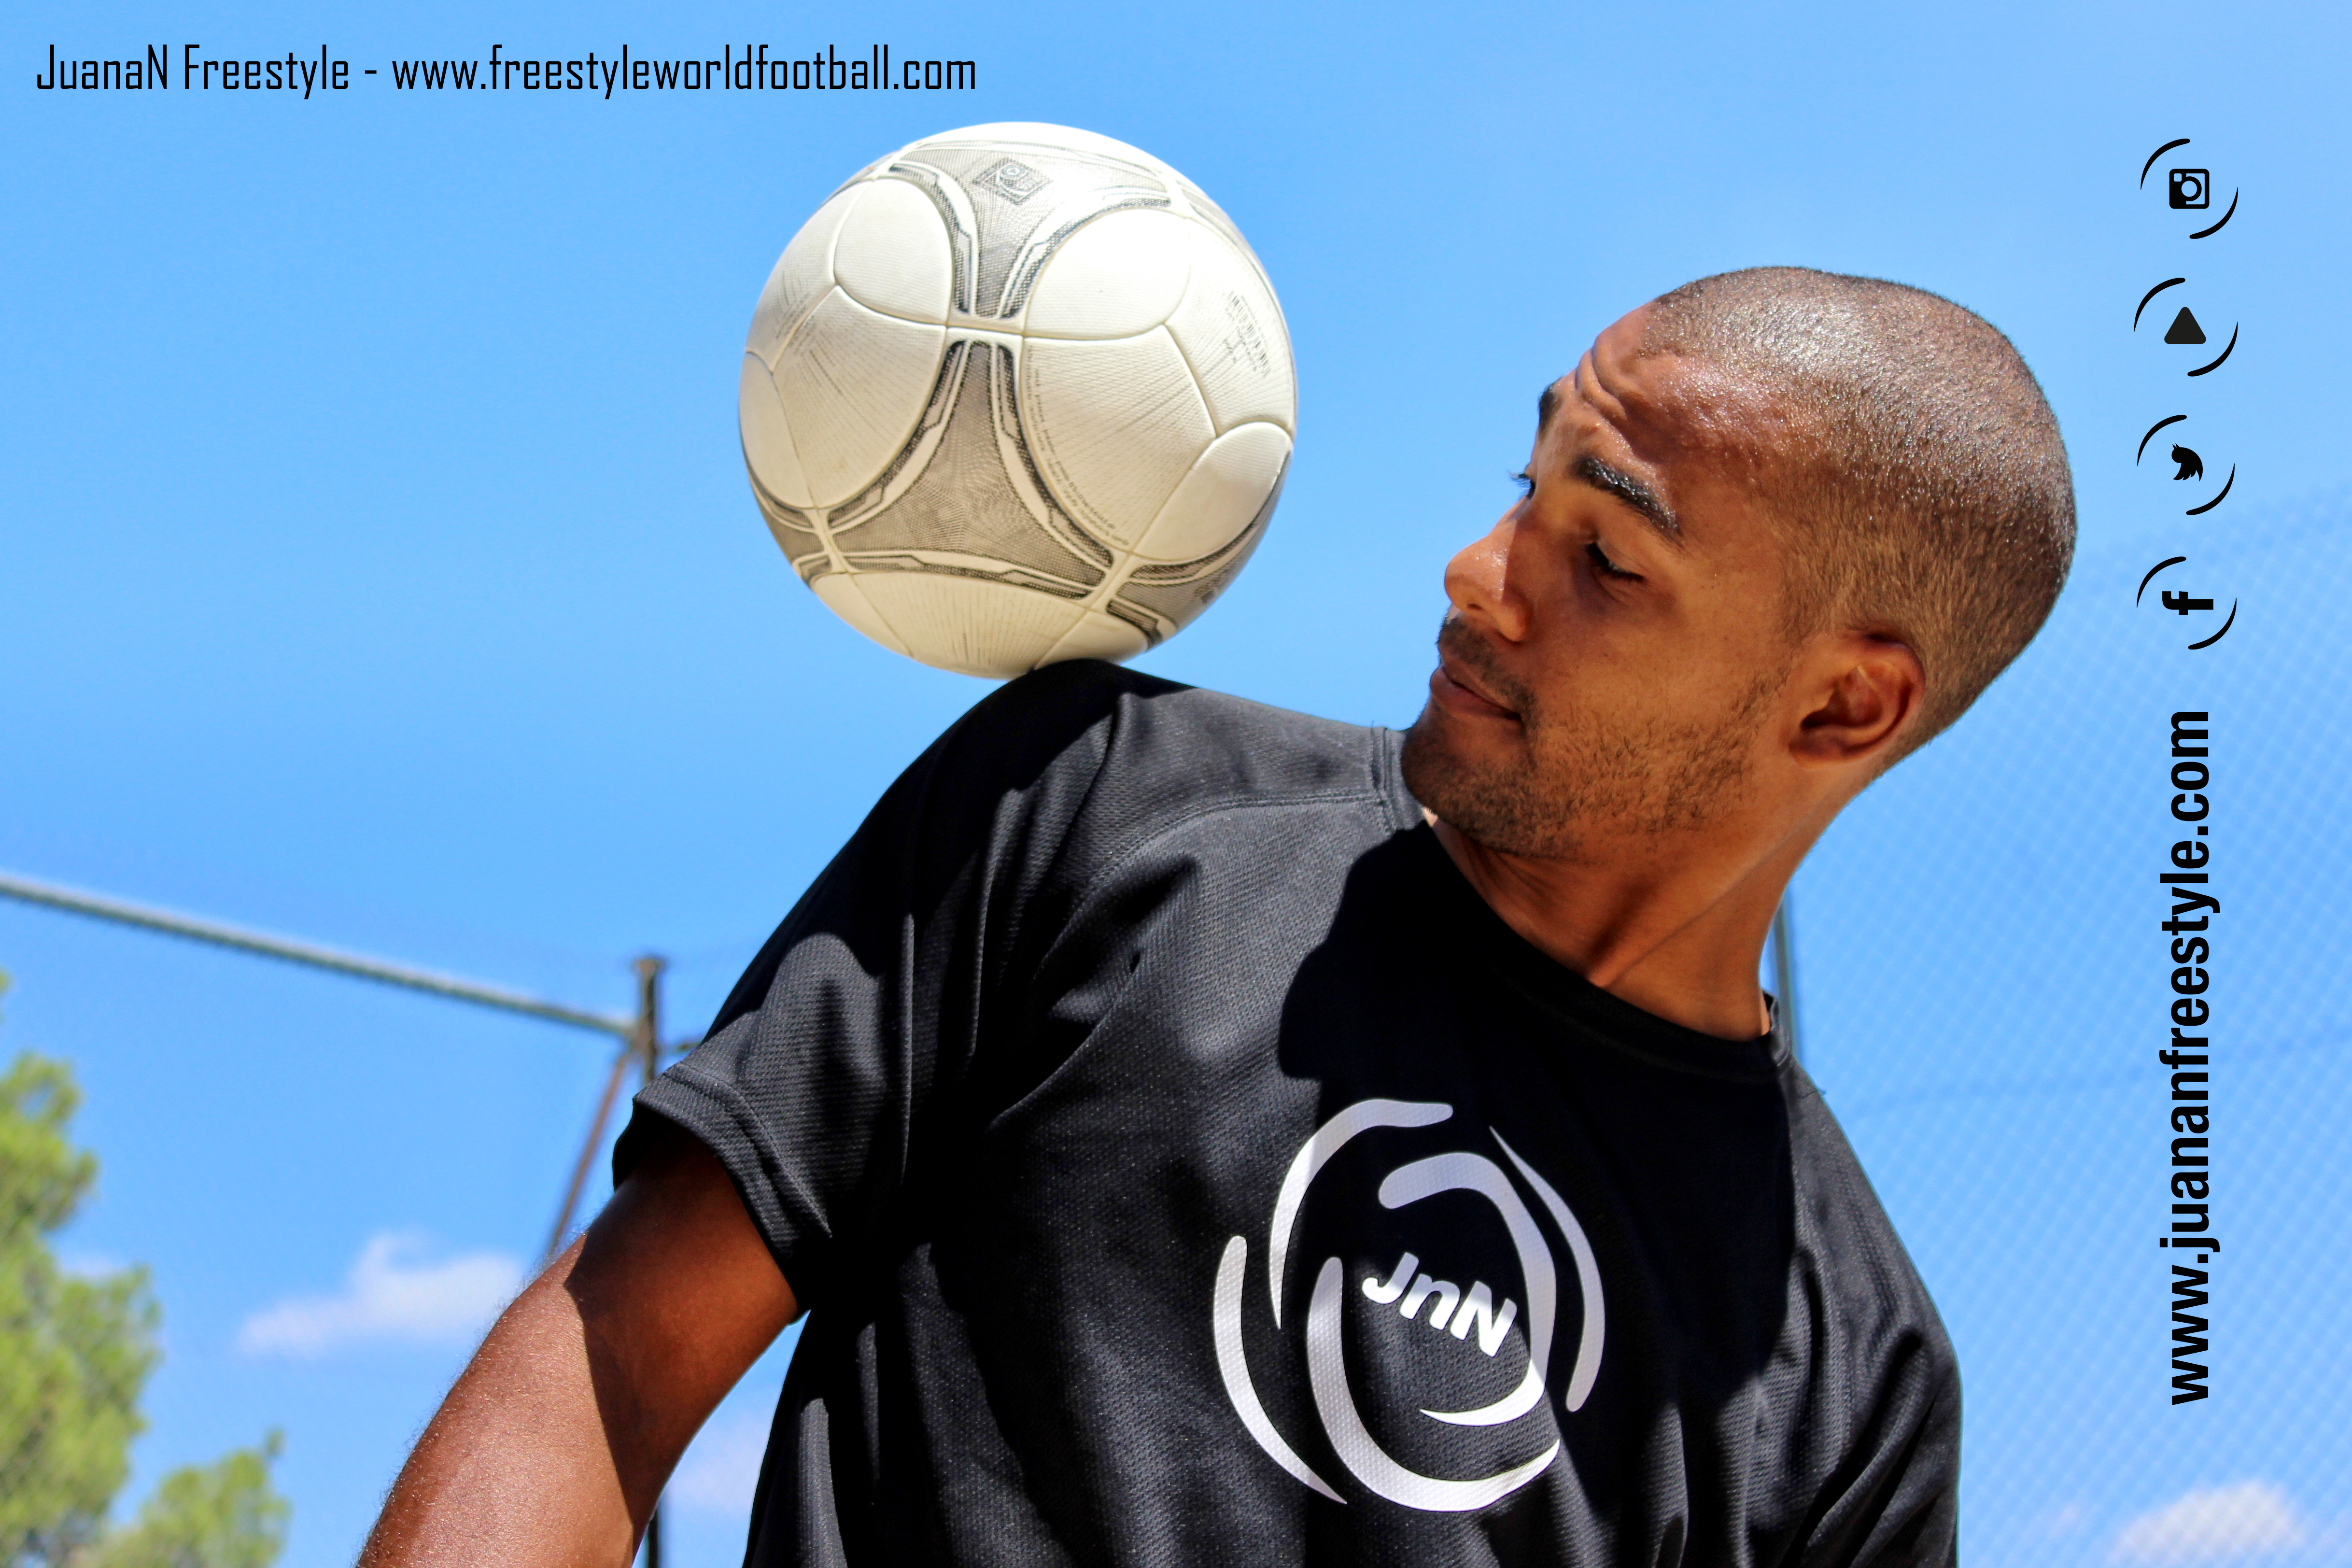 JuanaN Freestyle - 003 - www.freestyleworldfootball.com.jpg